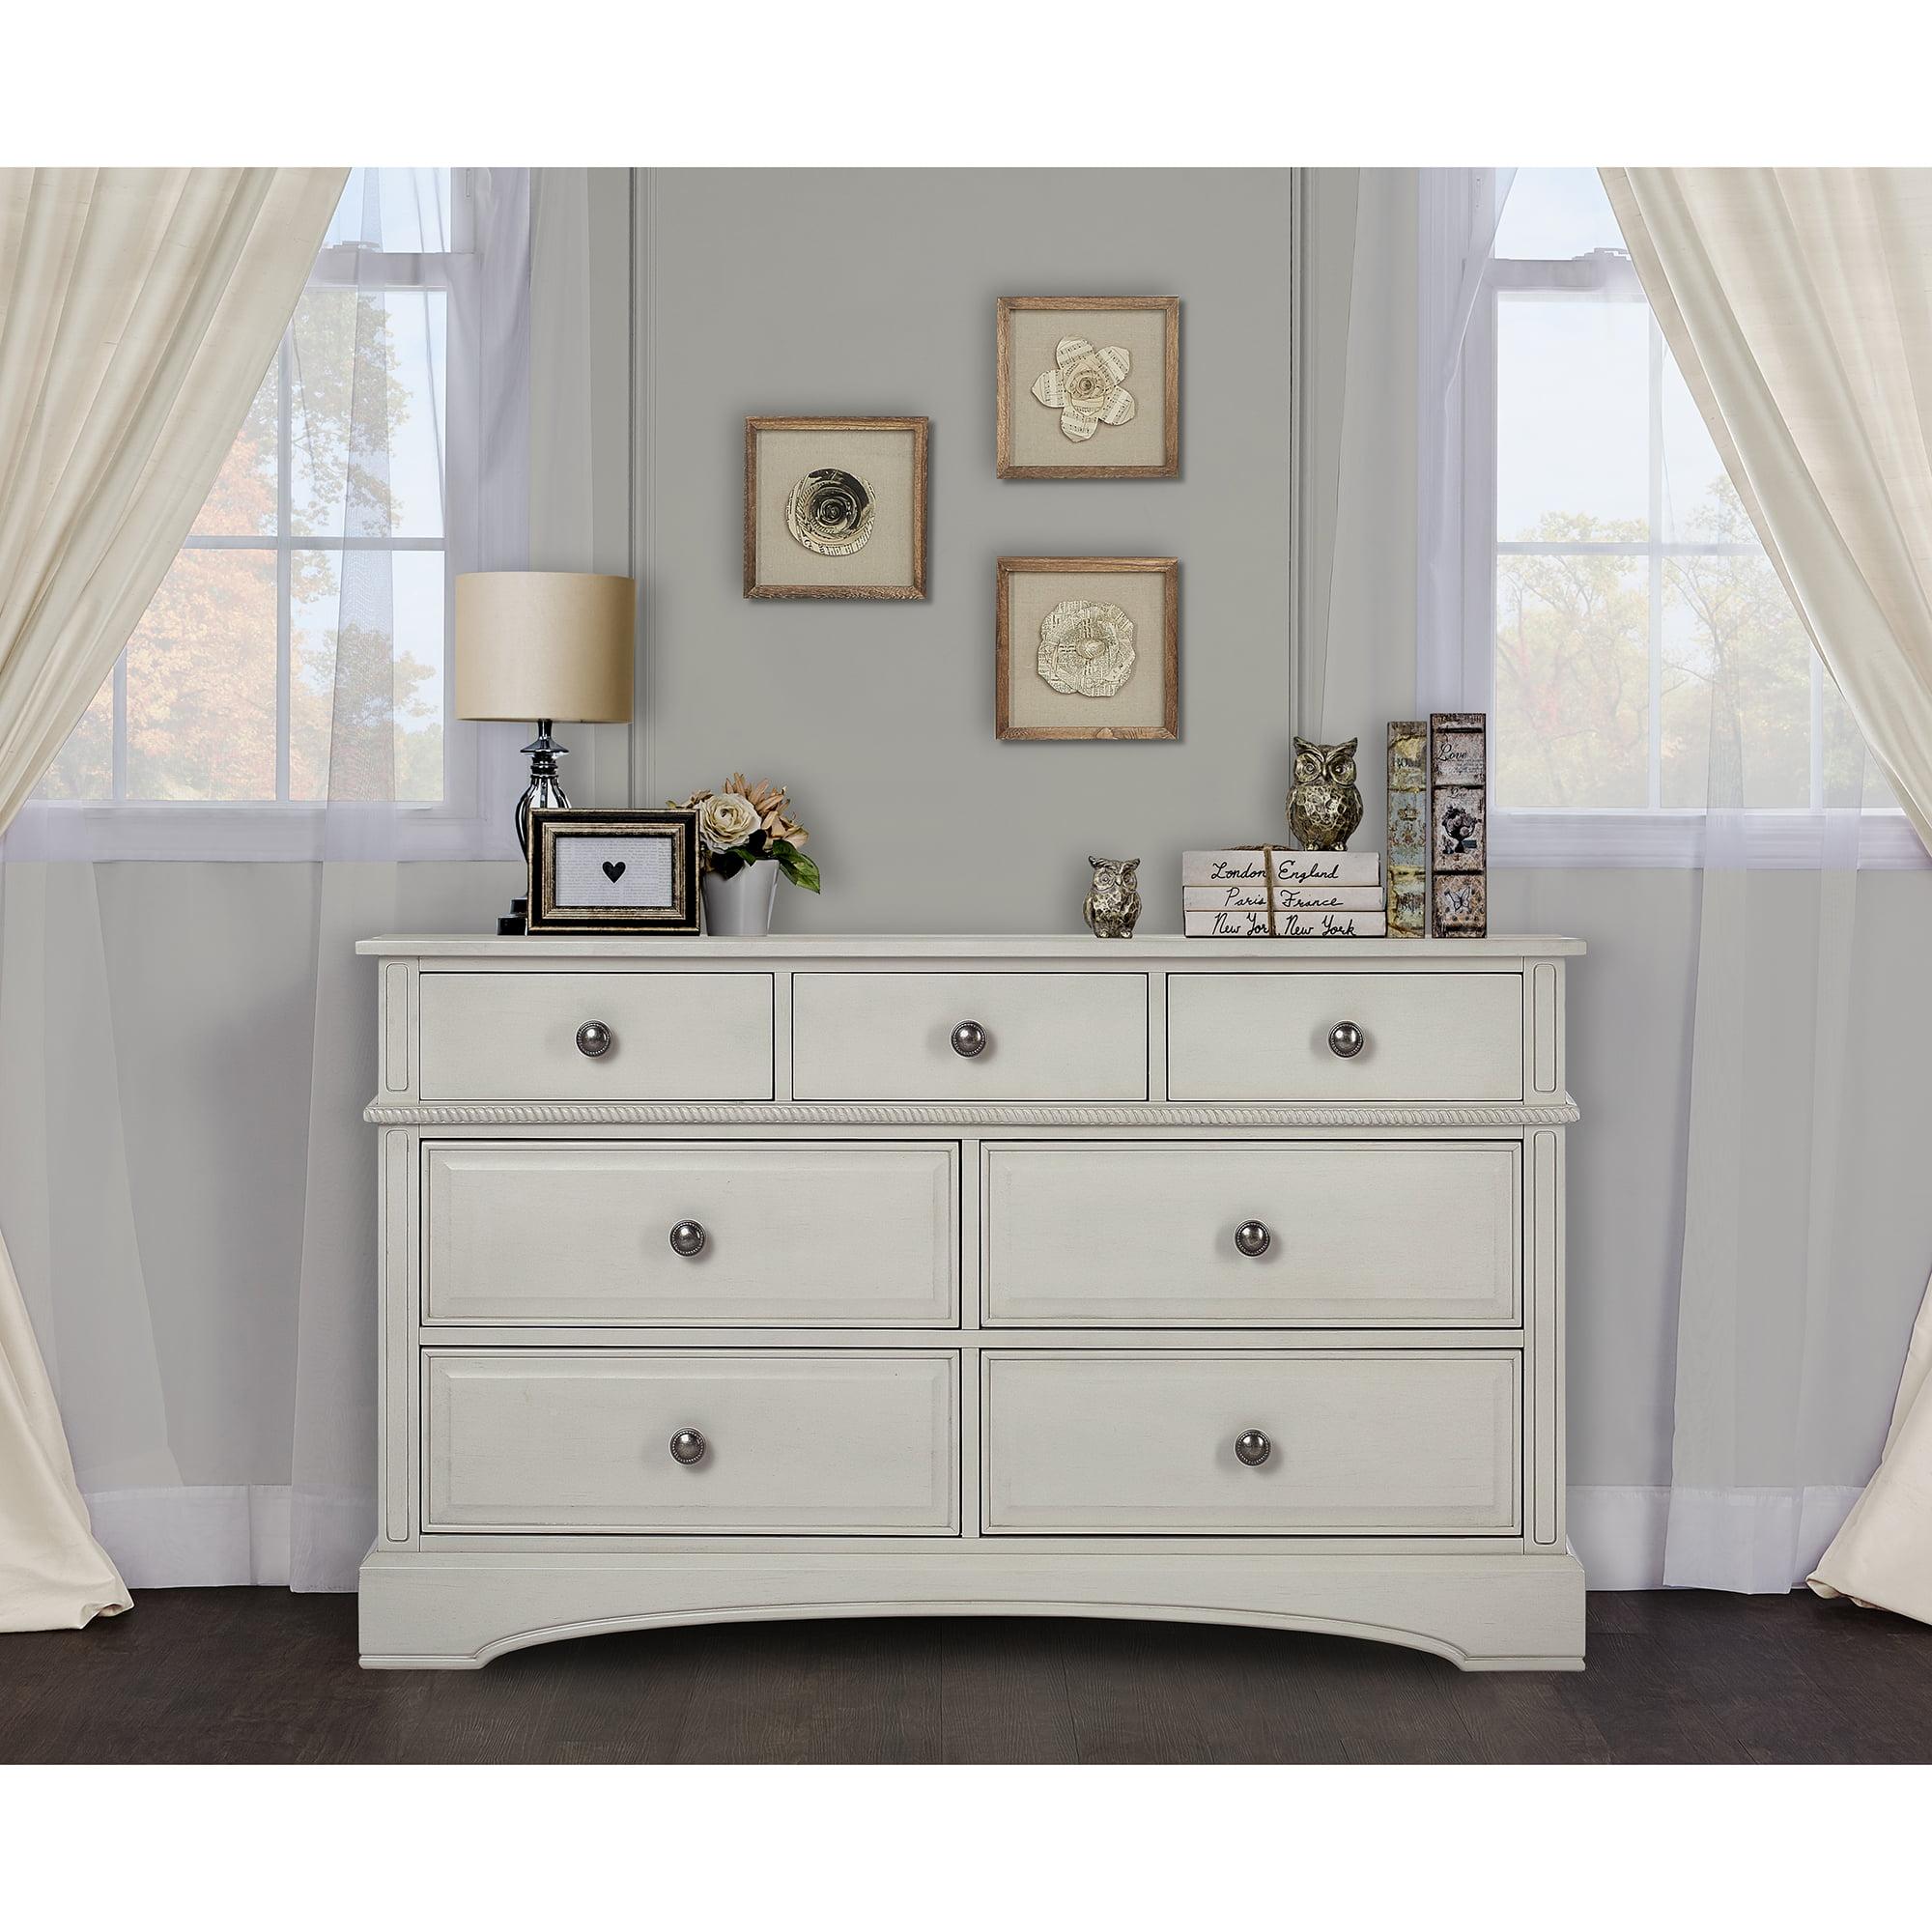 Evolur Double Drawer Dresser in Antique White by Evolur